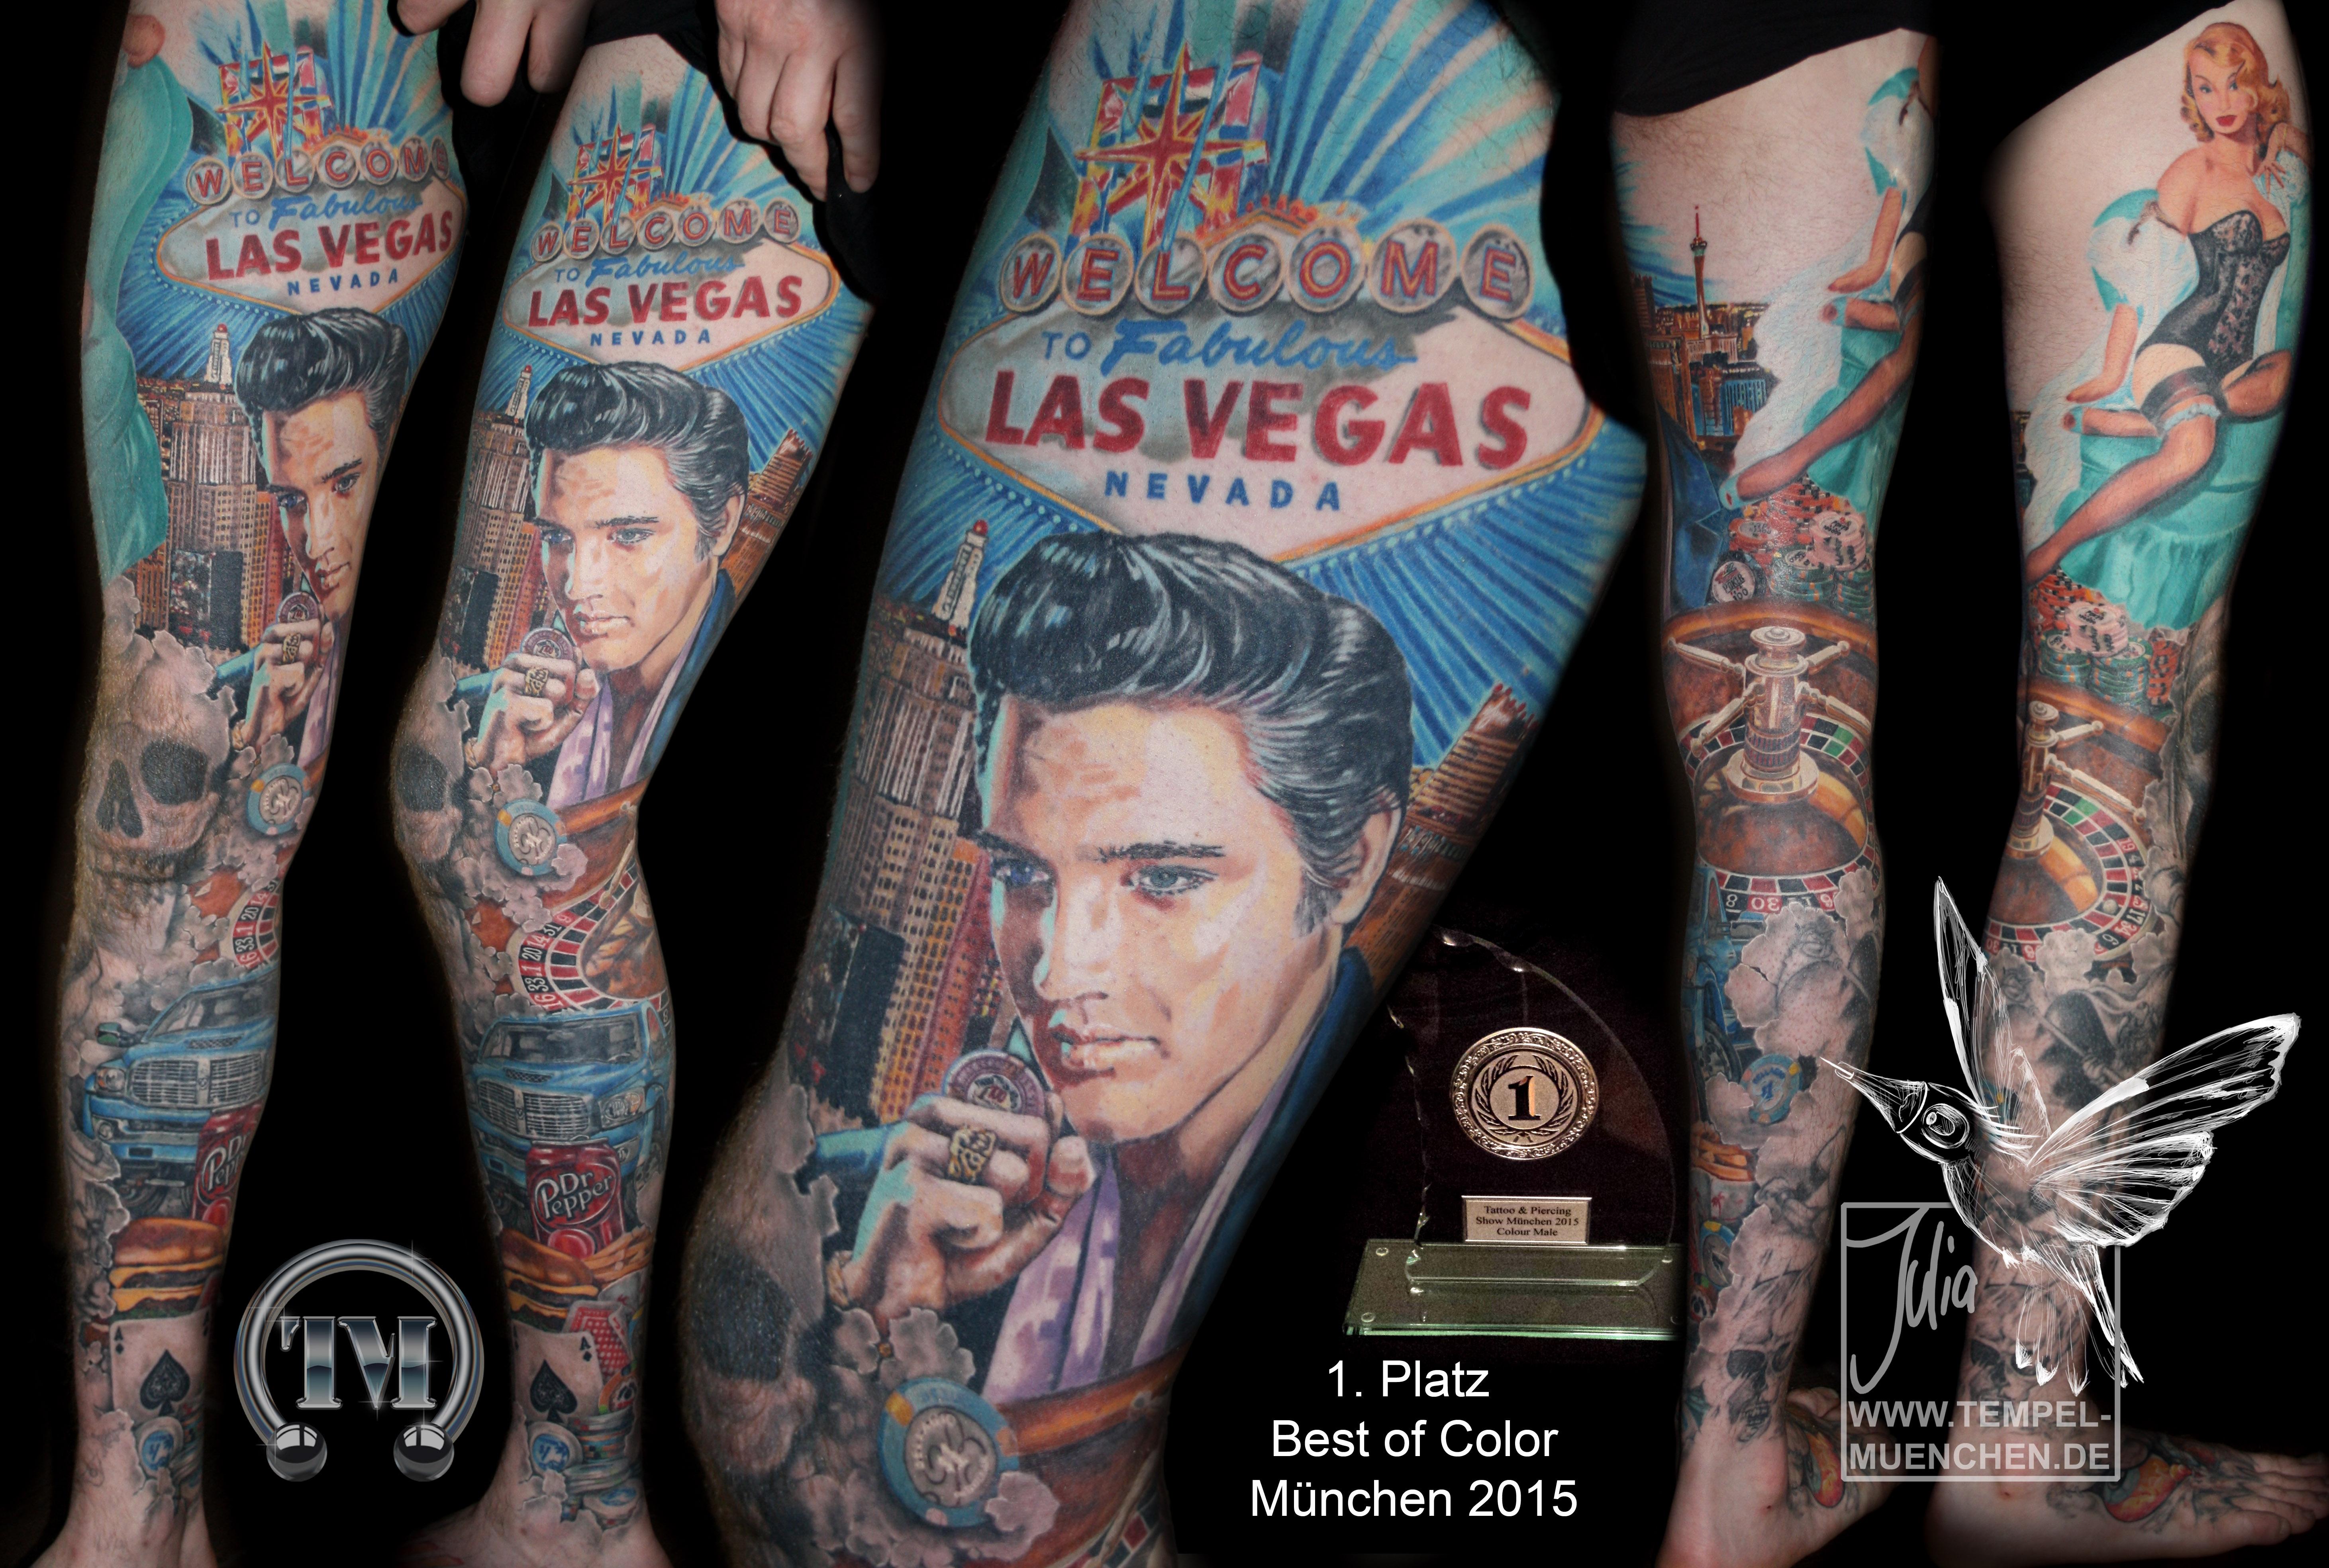 Julia bauer certified artist for Las vegas tattoo